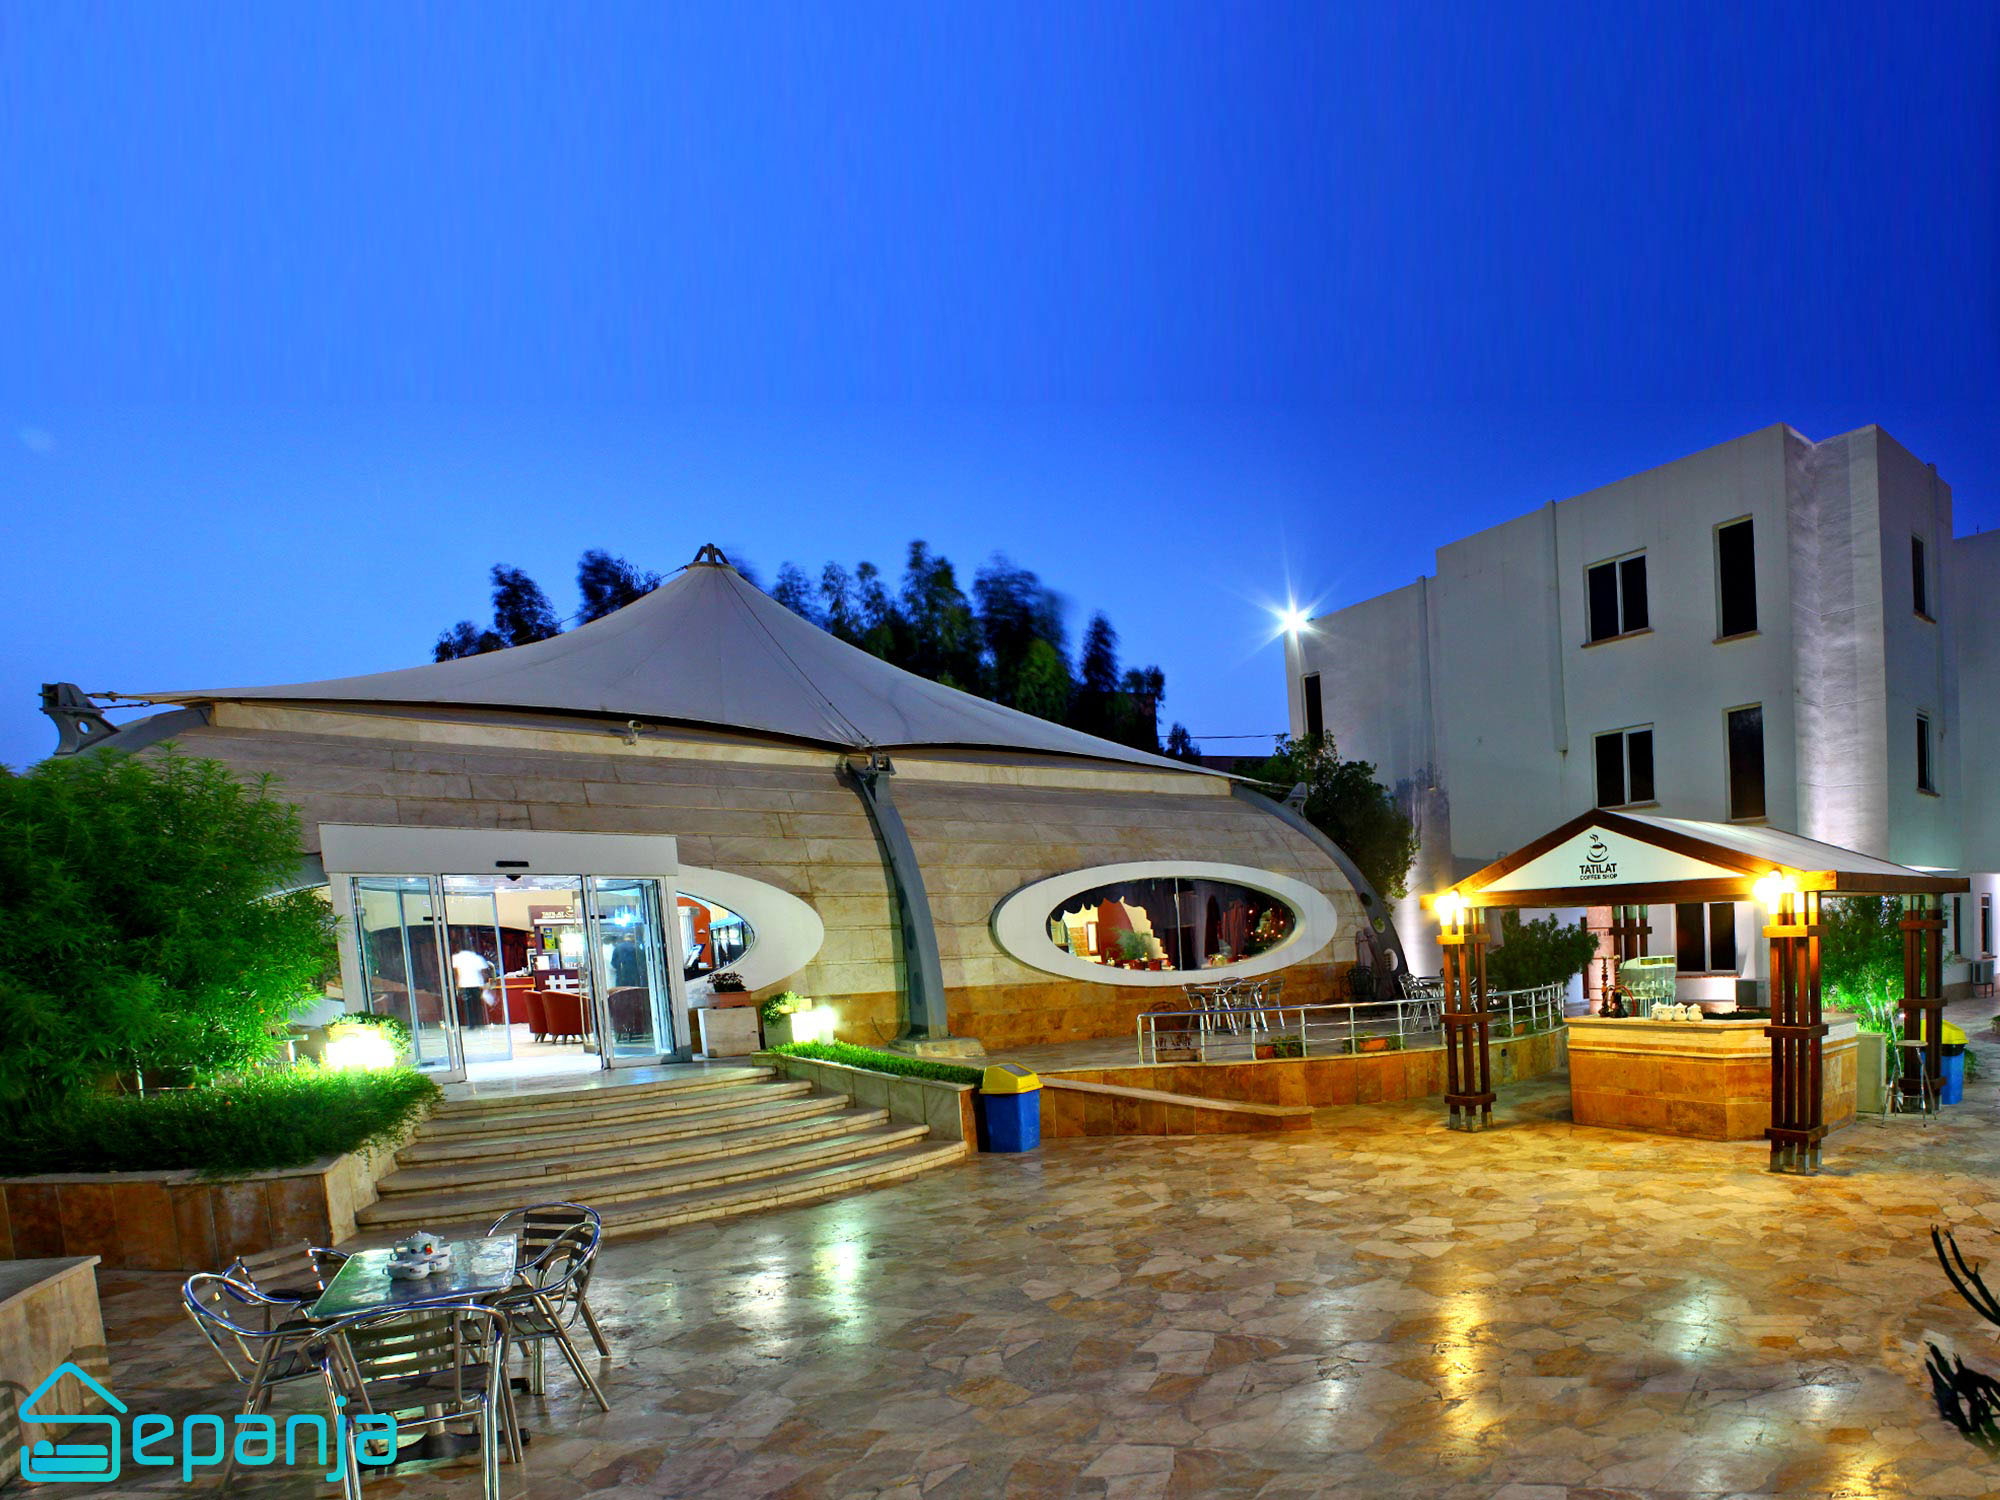 هتل فلامینگو در کیش